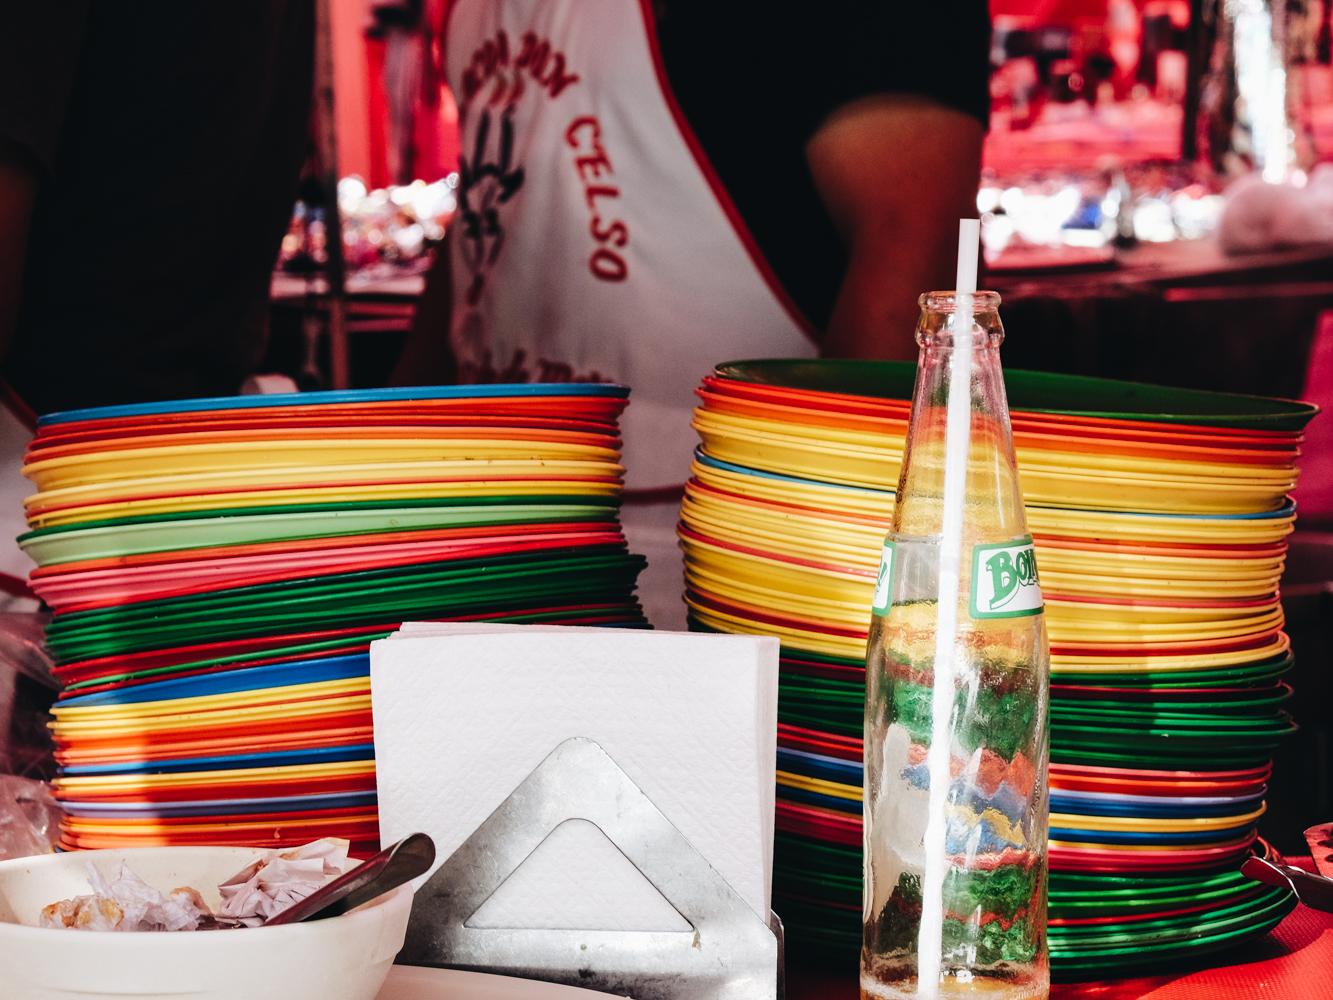 street_food-Cookwilltravel-Mexico_City.jpg